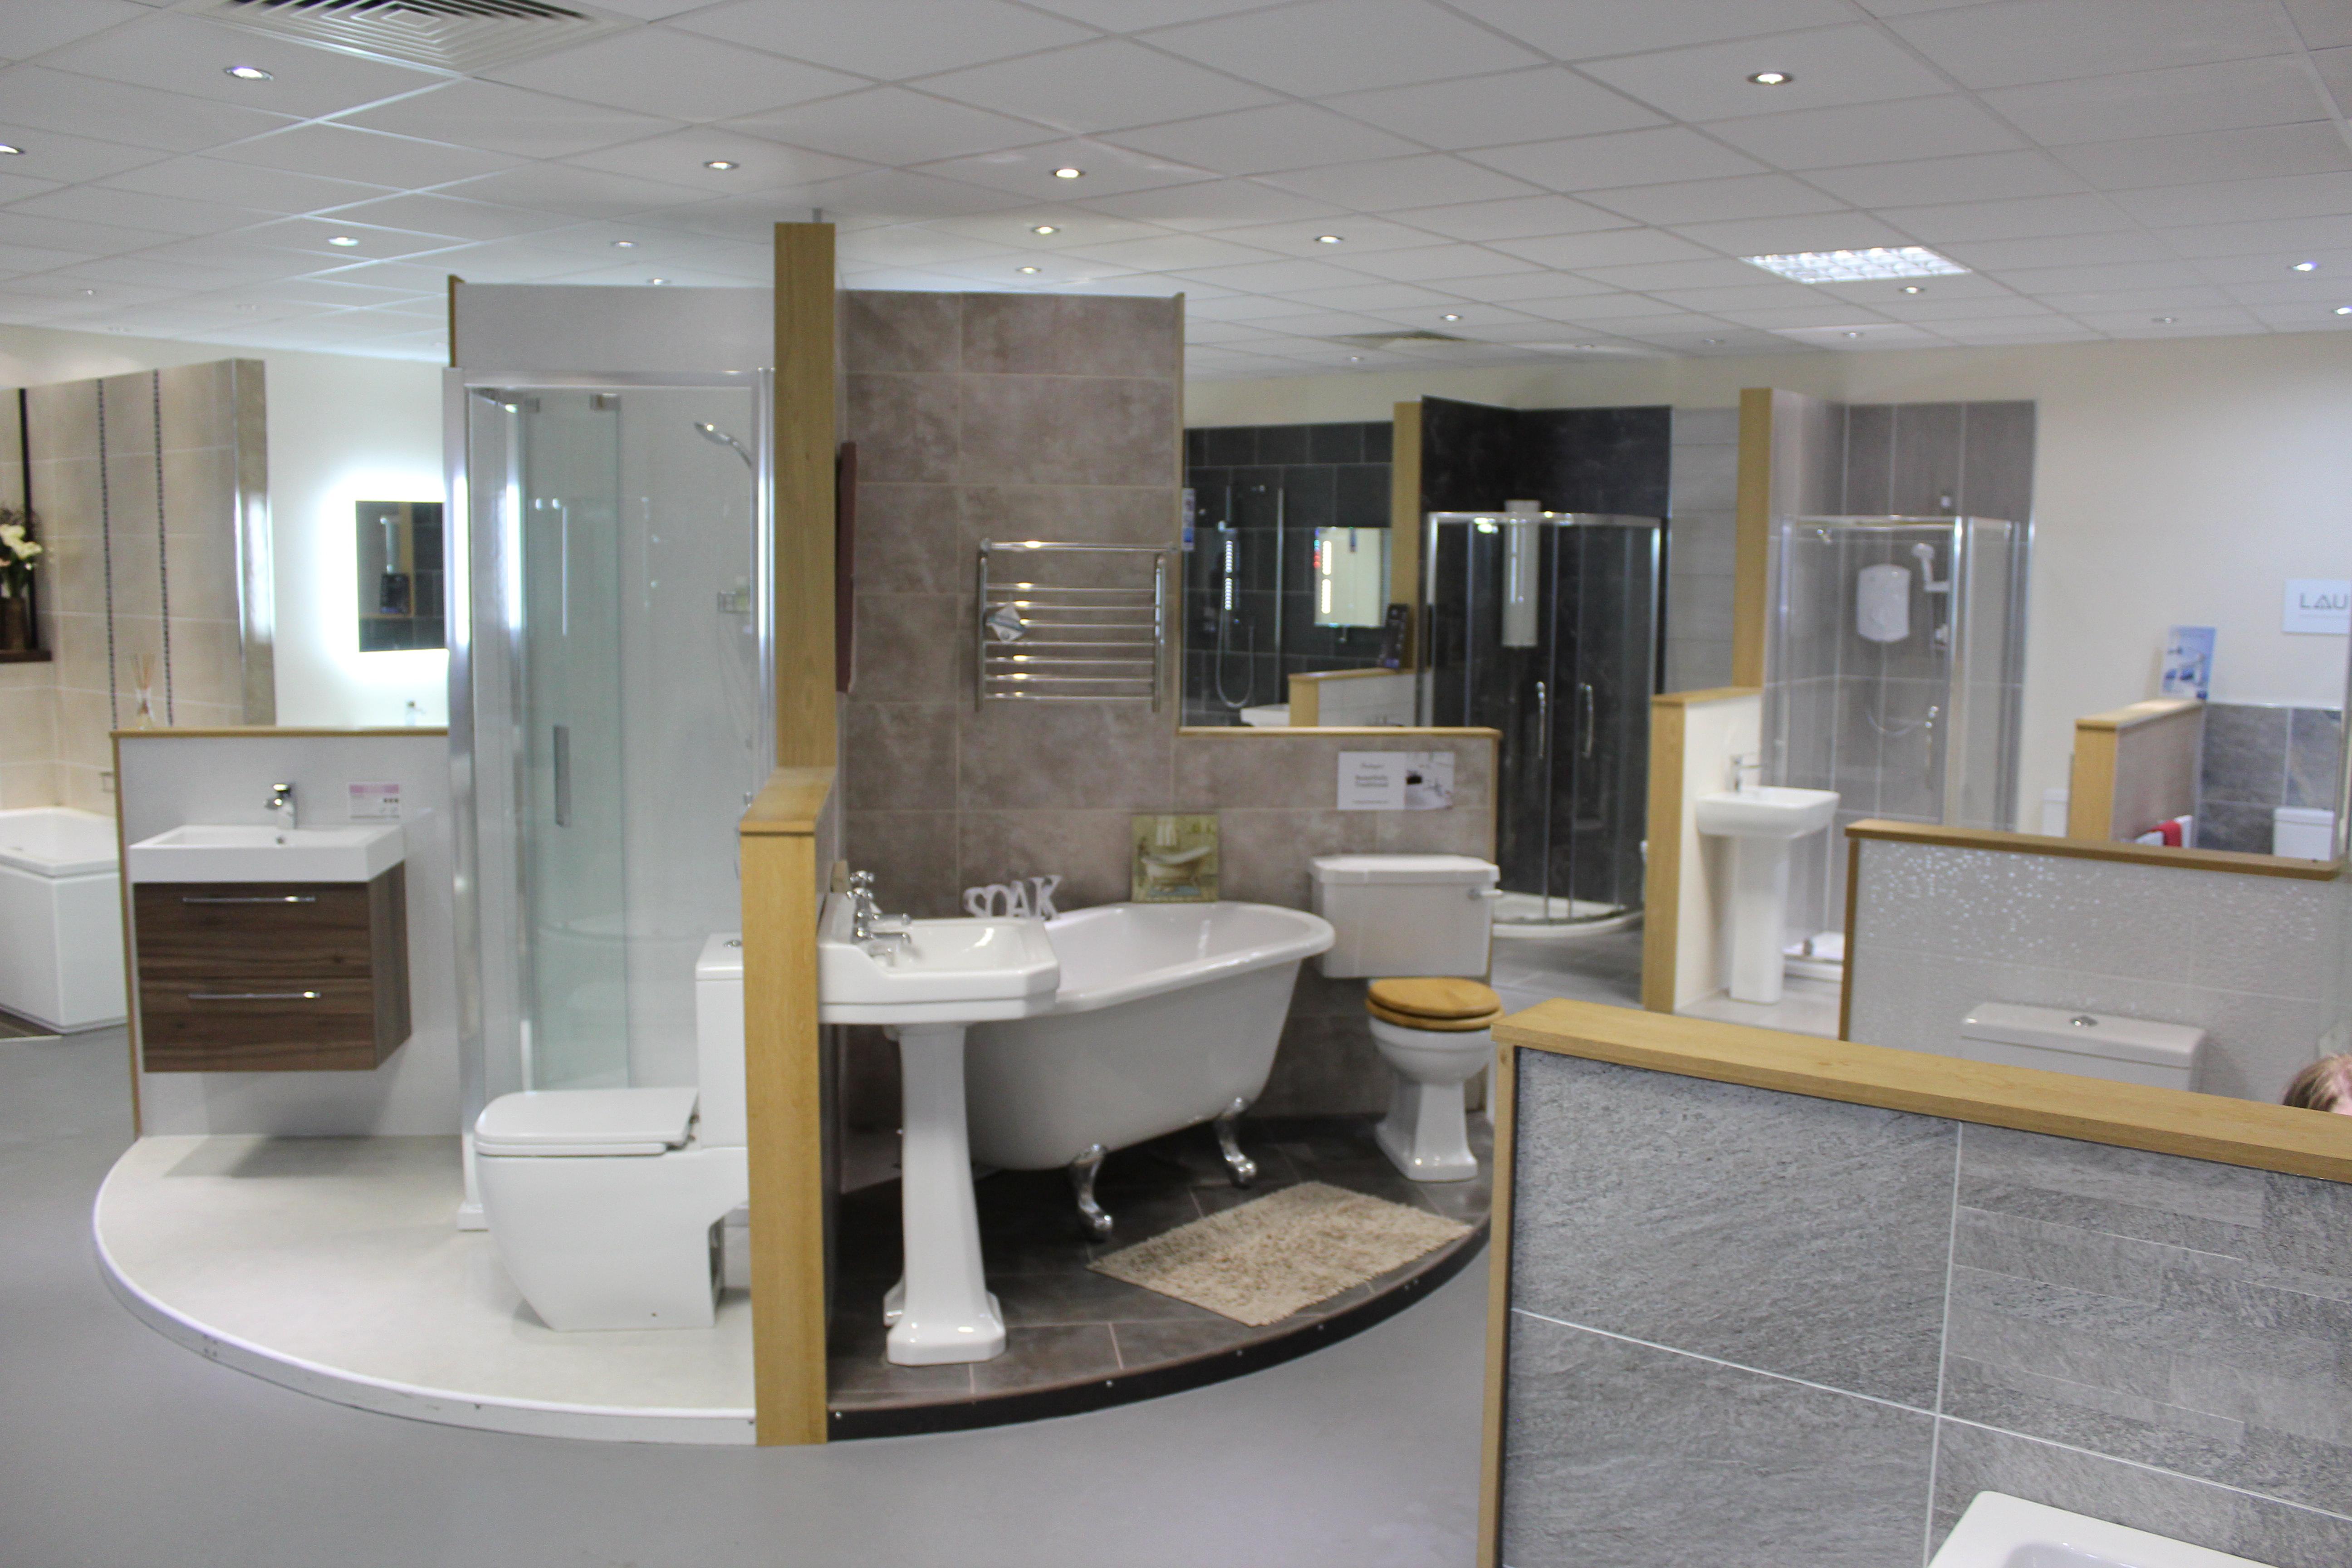 Bathroom showrooms Bathroom design showrooms Home furniture kitchenagenda com UCQKRMR